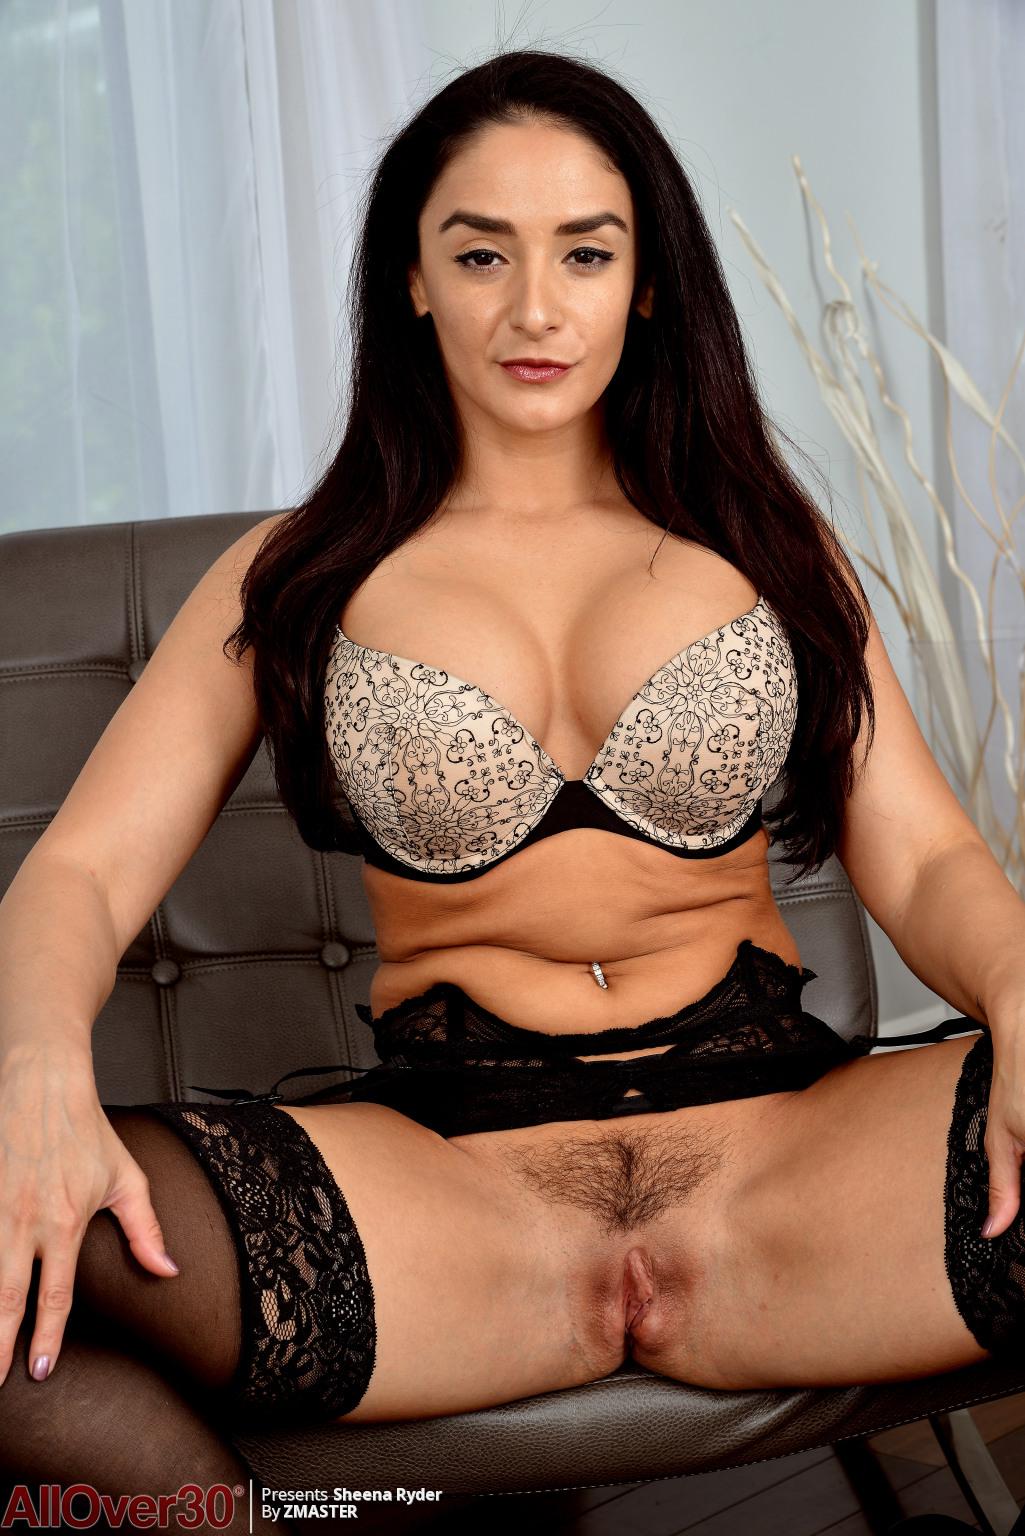 big-tits-beauty-sheena-ryder-06